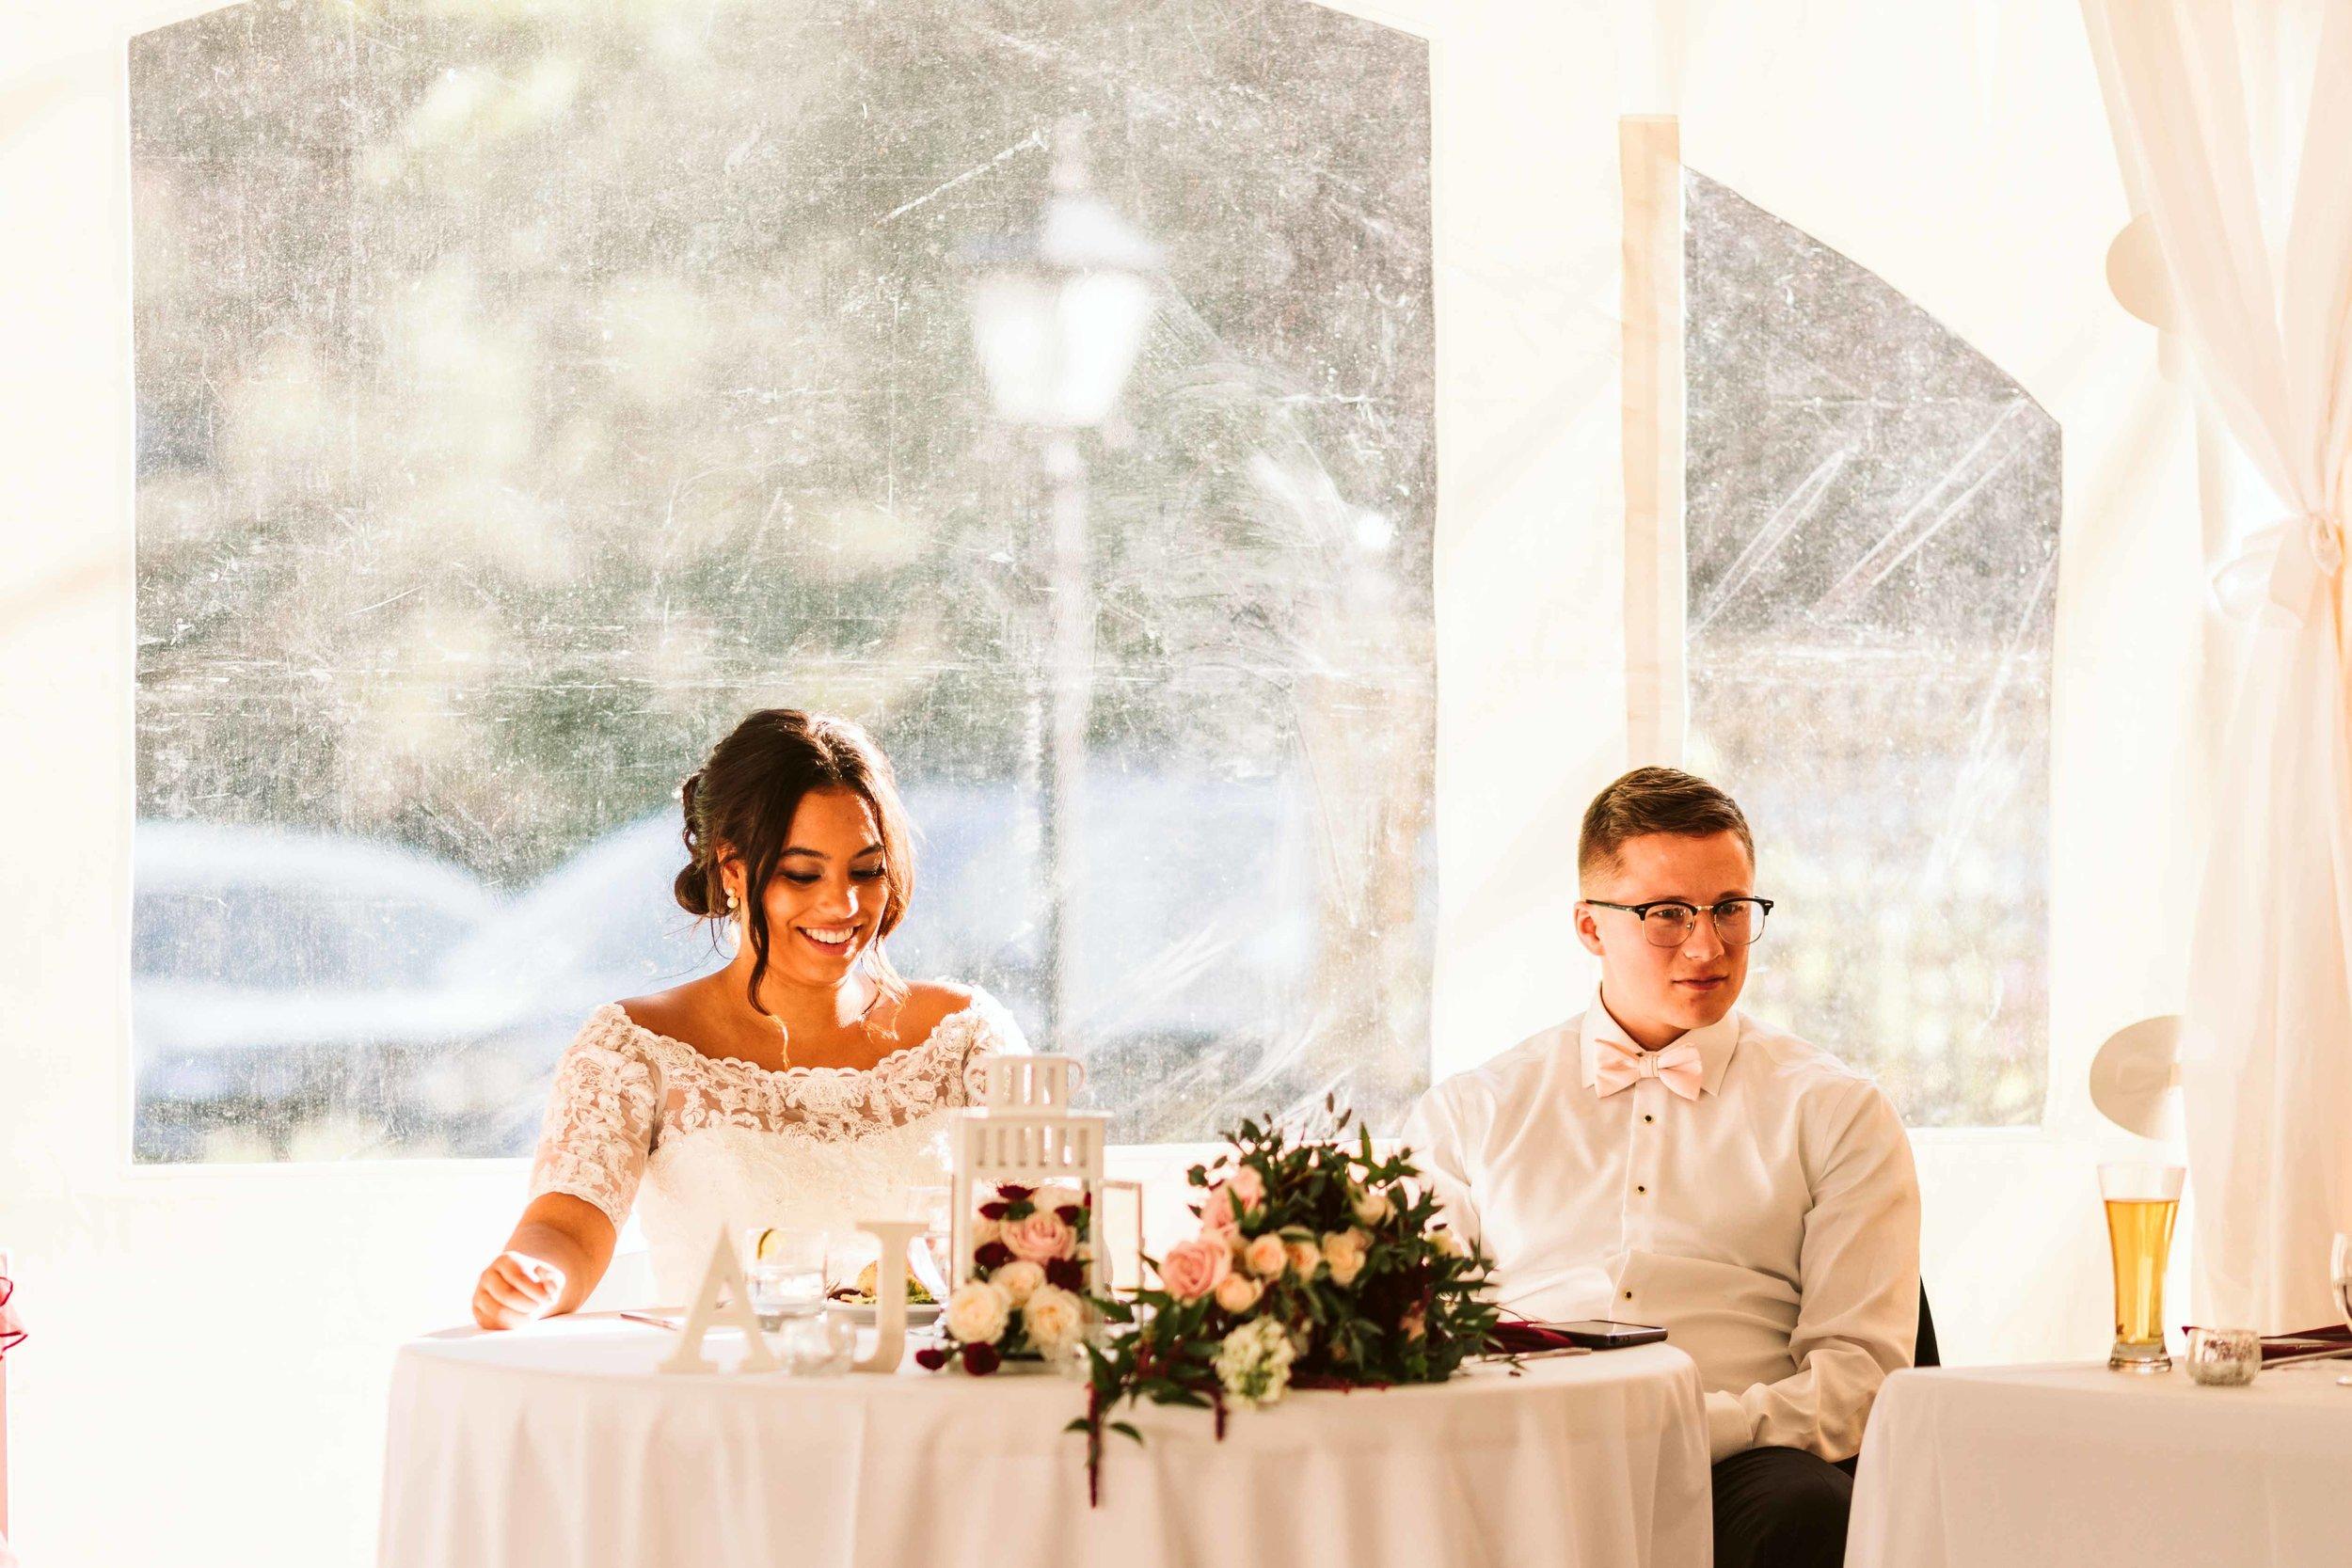 lairmont-manor-wedding-85.jpg